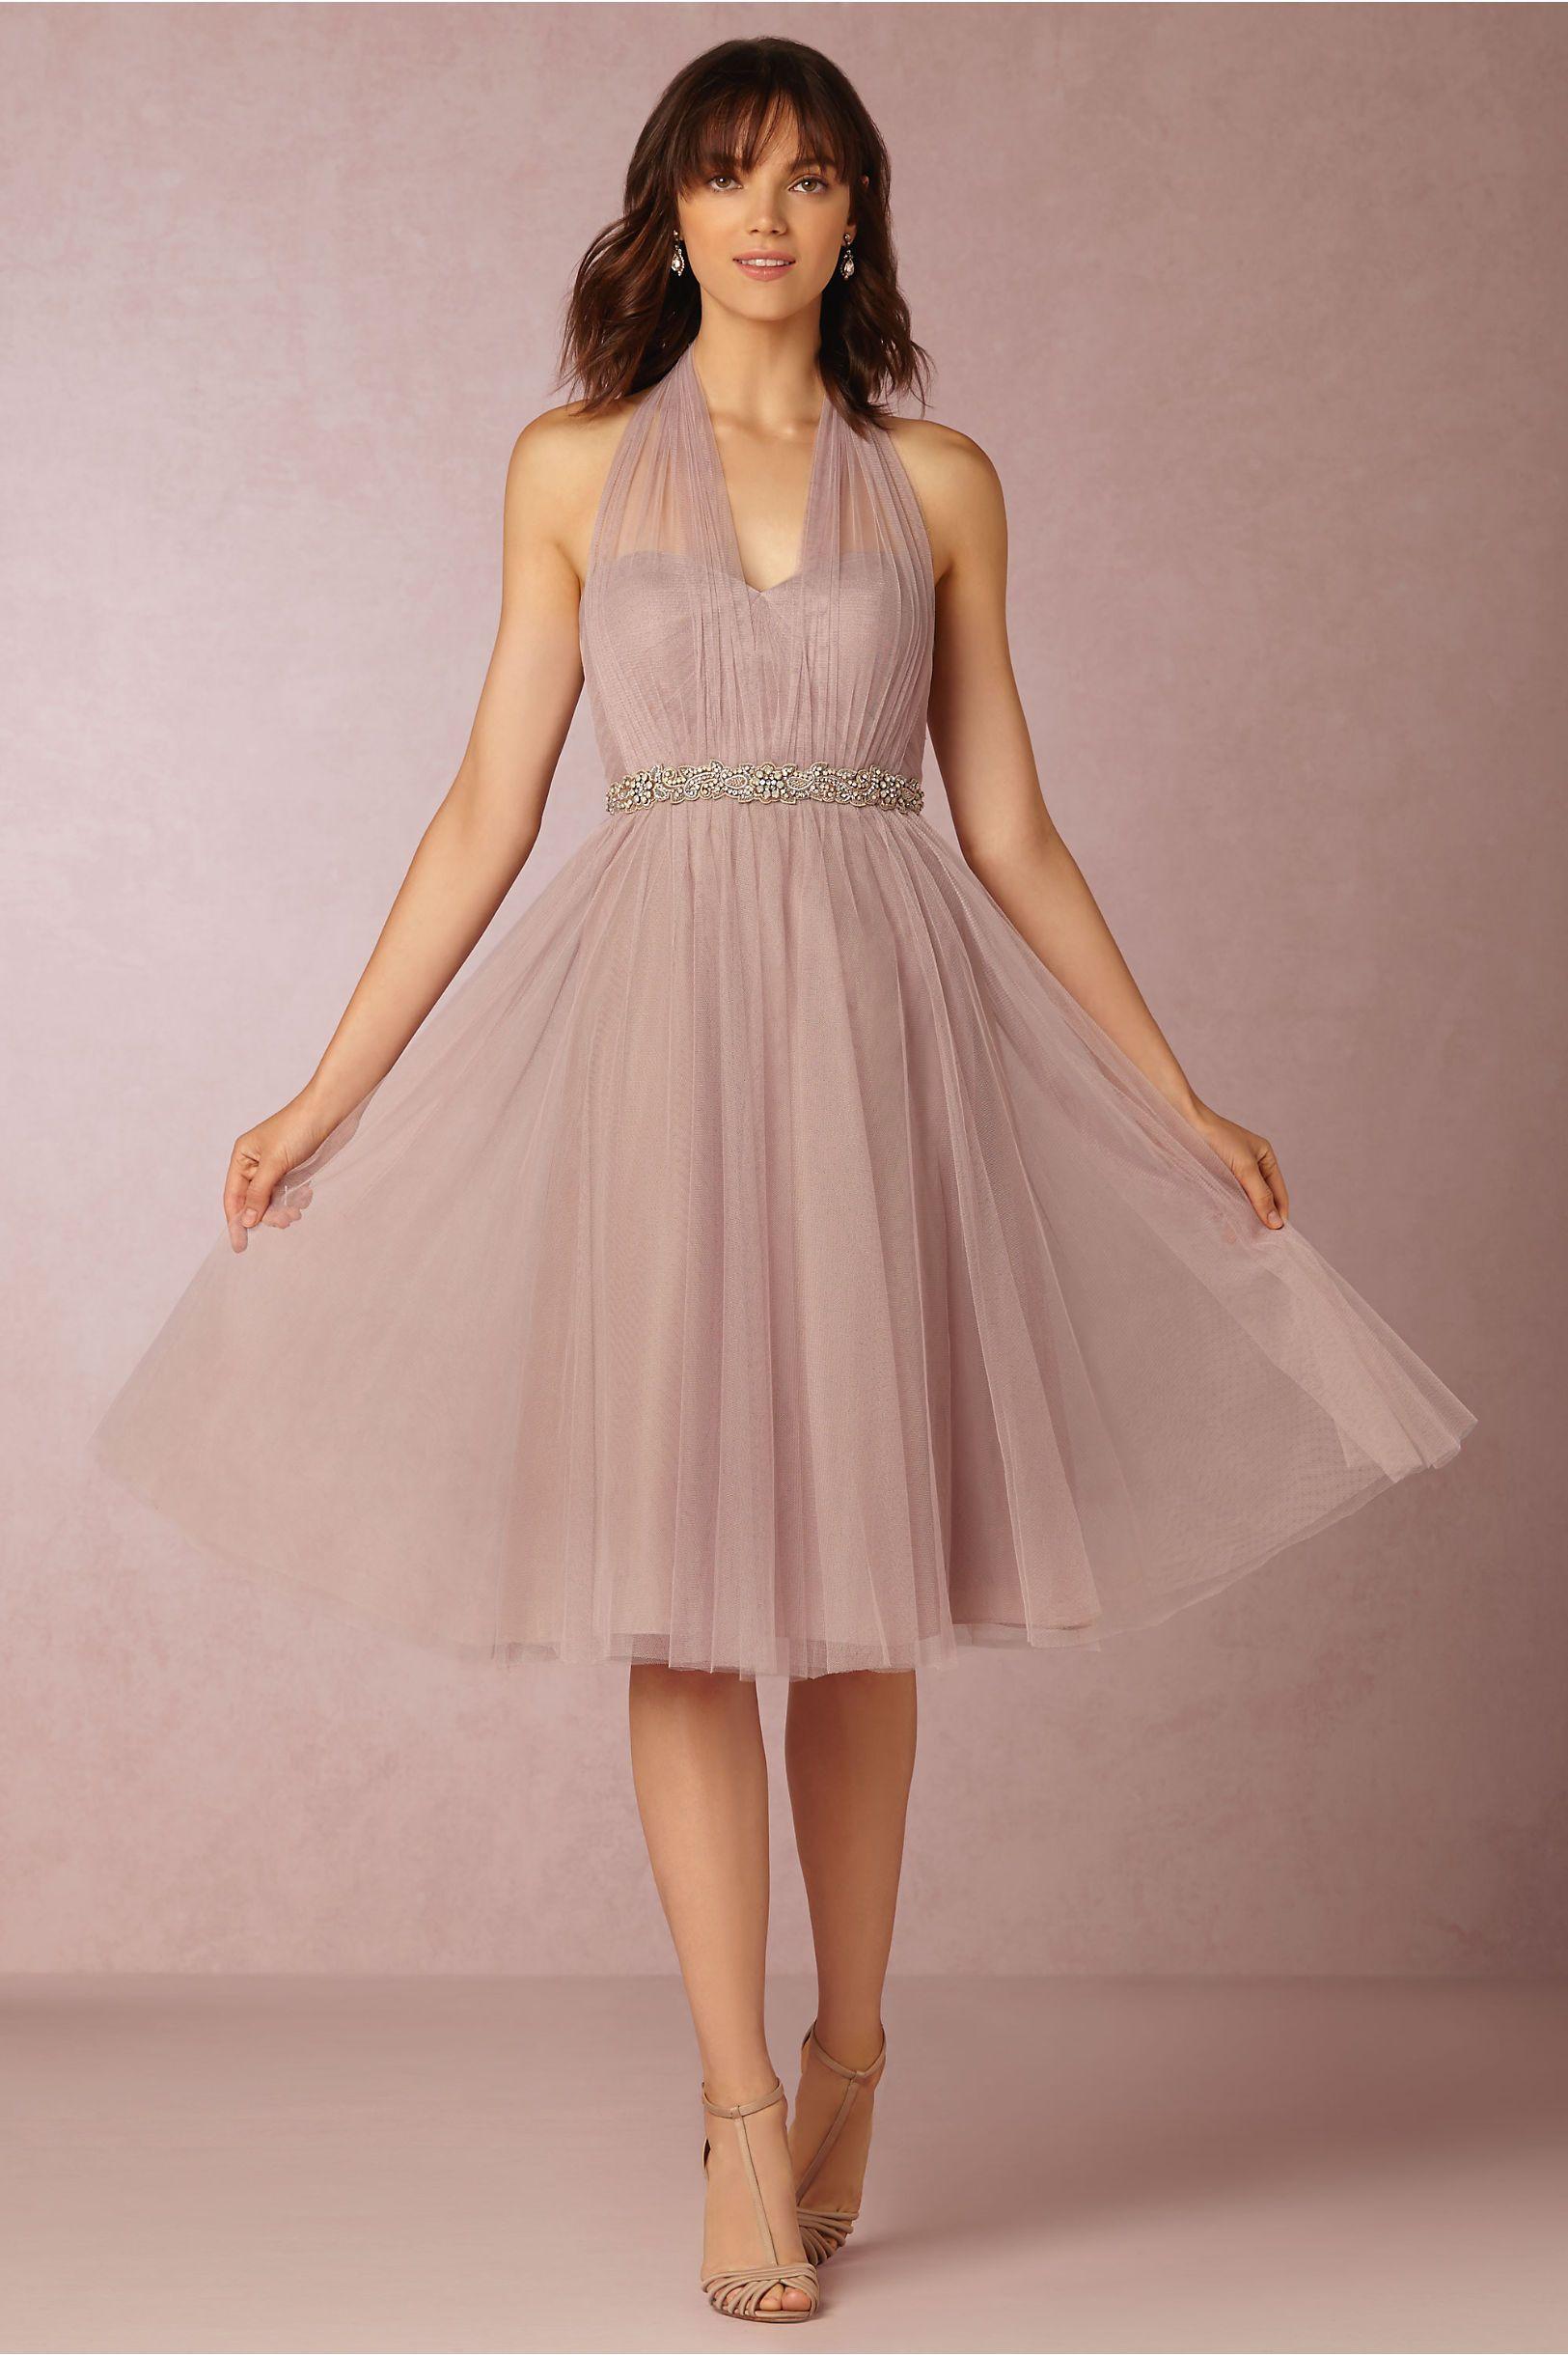 BHLDN Maia Dress in Bridesmaids Bridesmaid Dresses at BHLDN | Dream ...